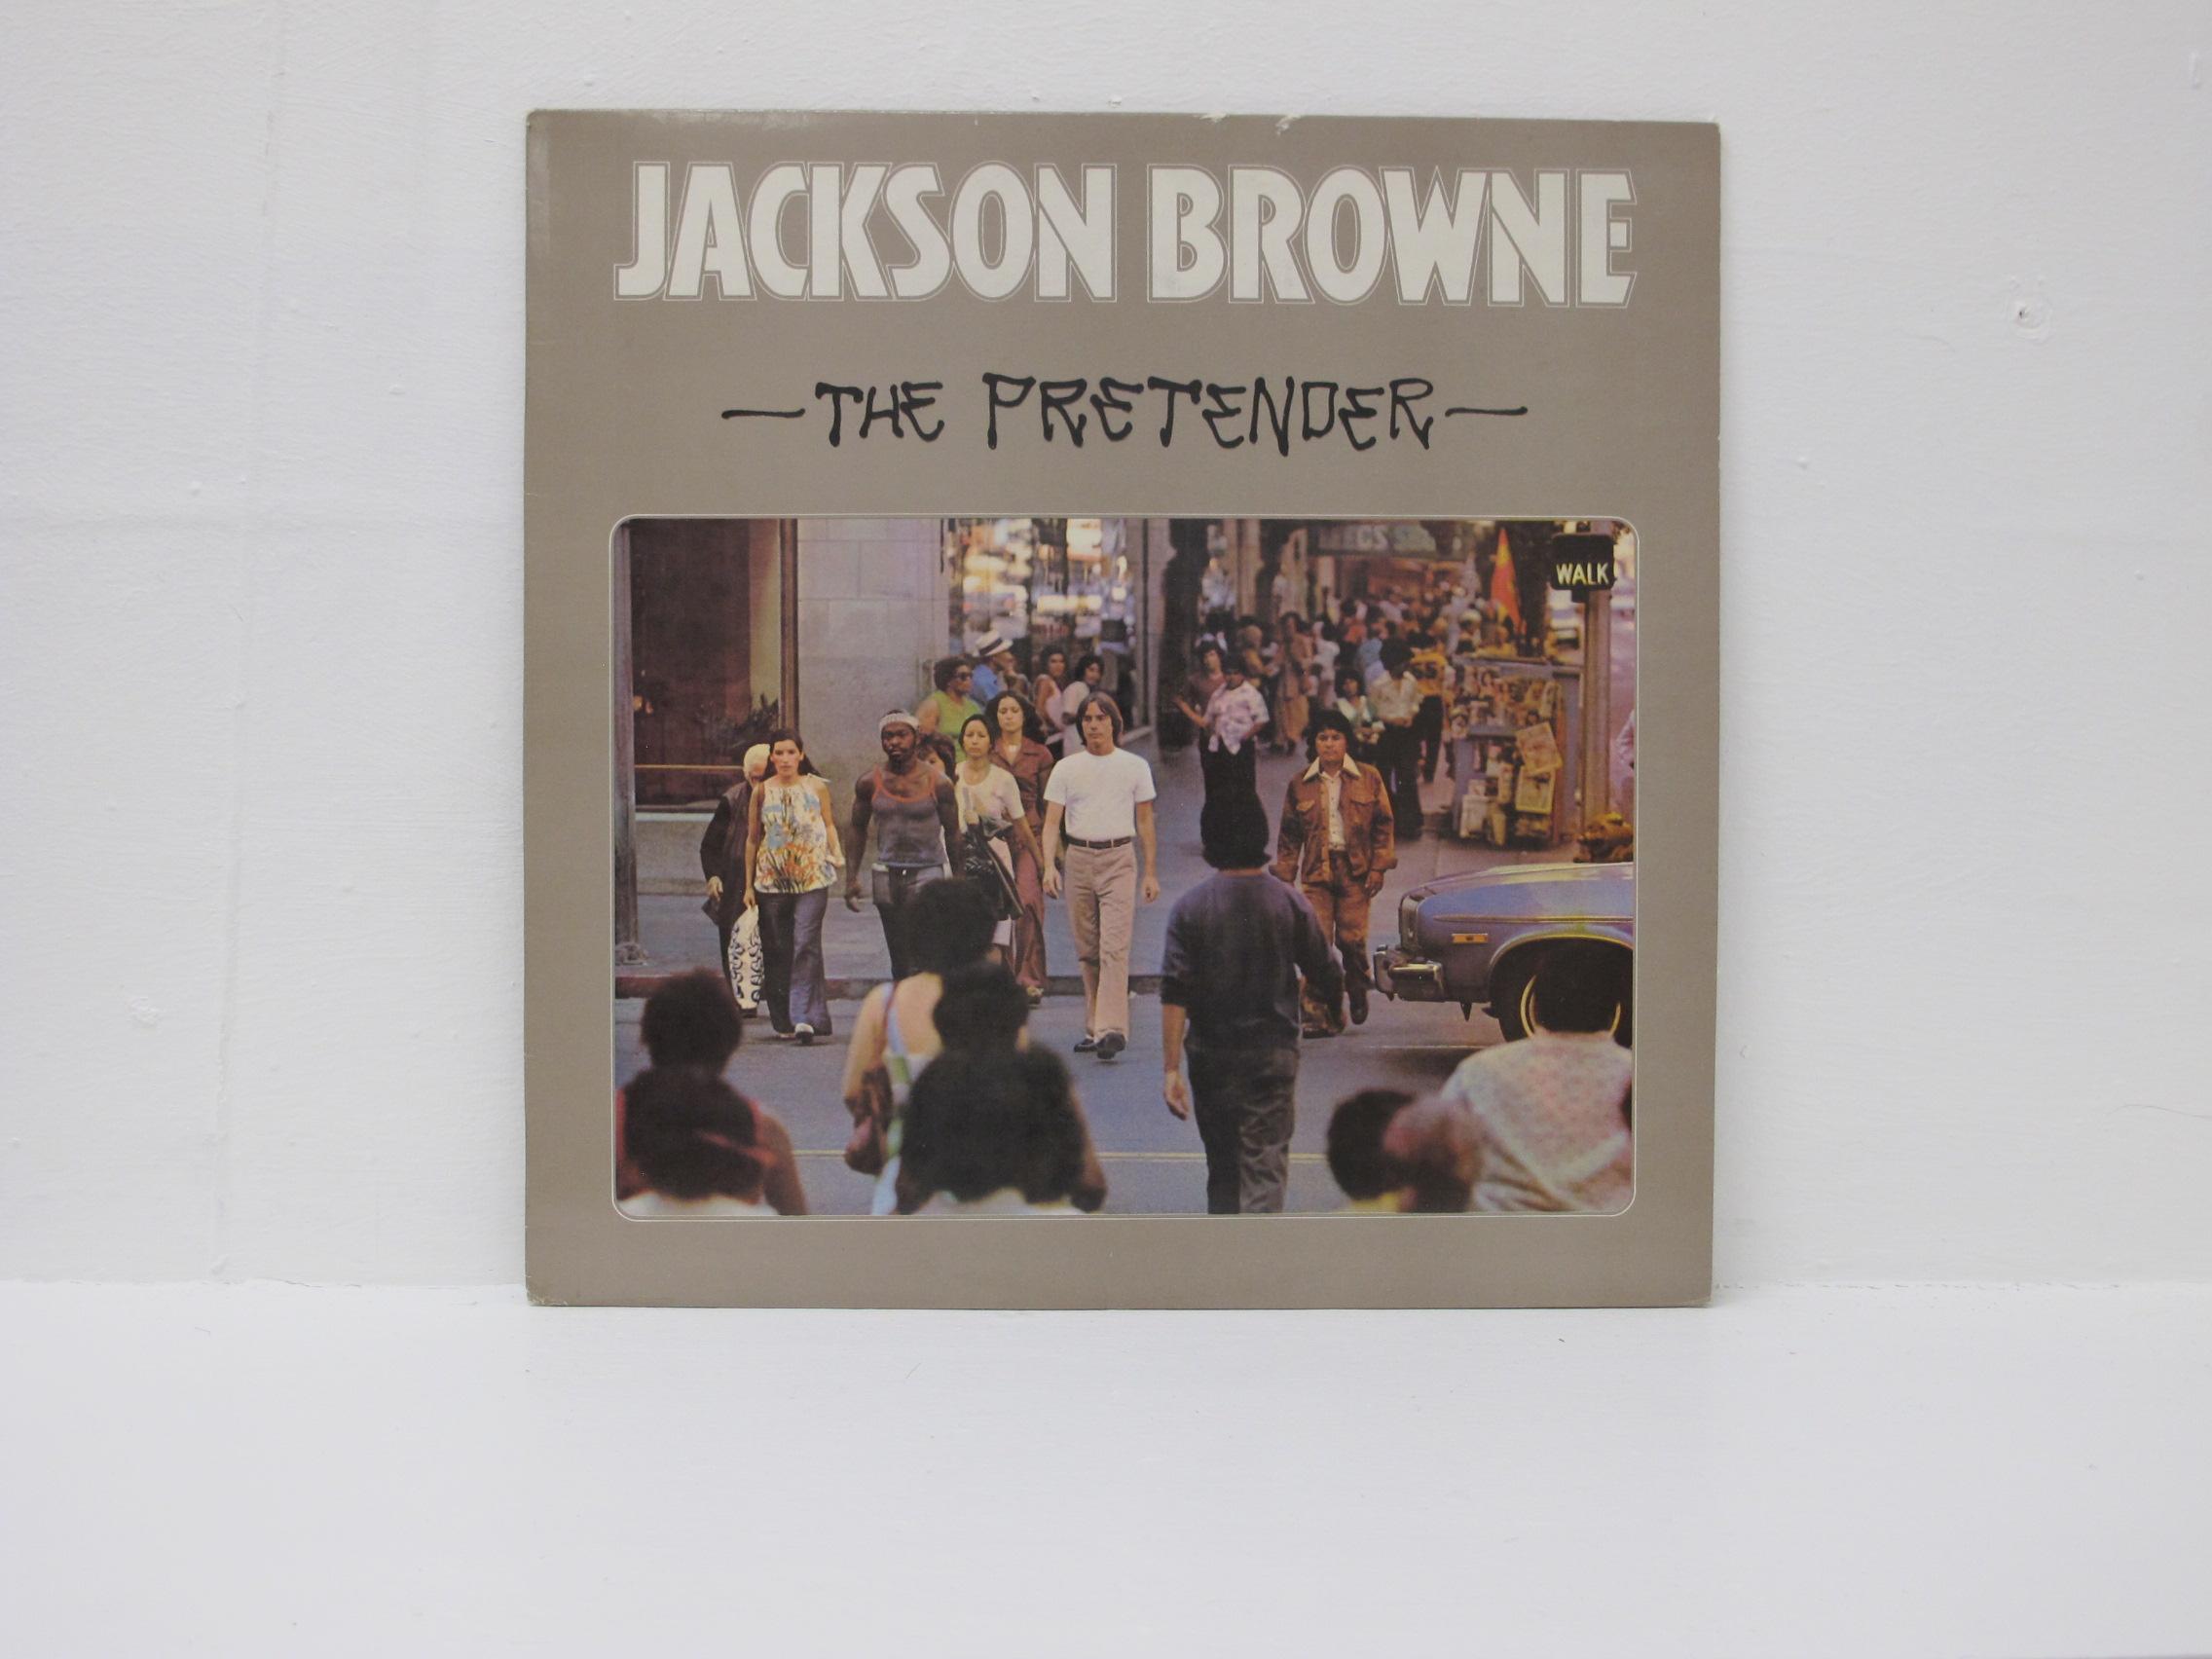 Jackson Browne - The Prentender